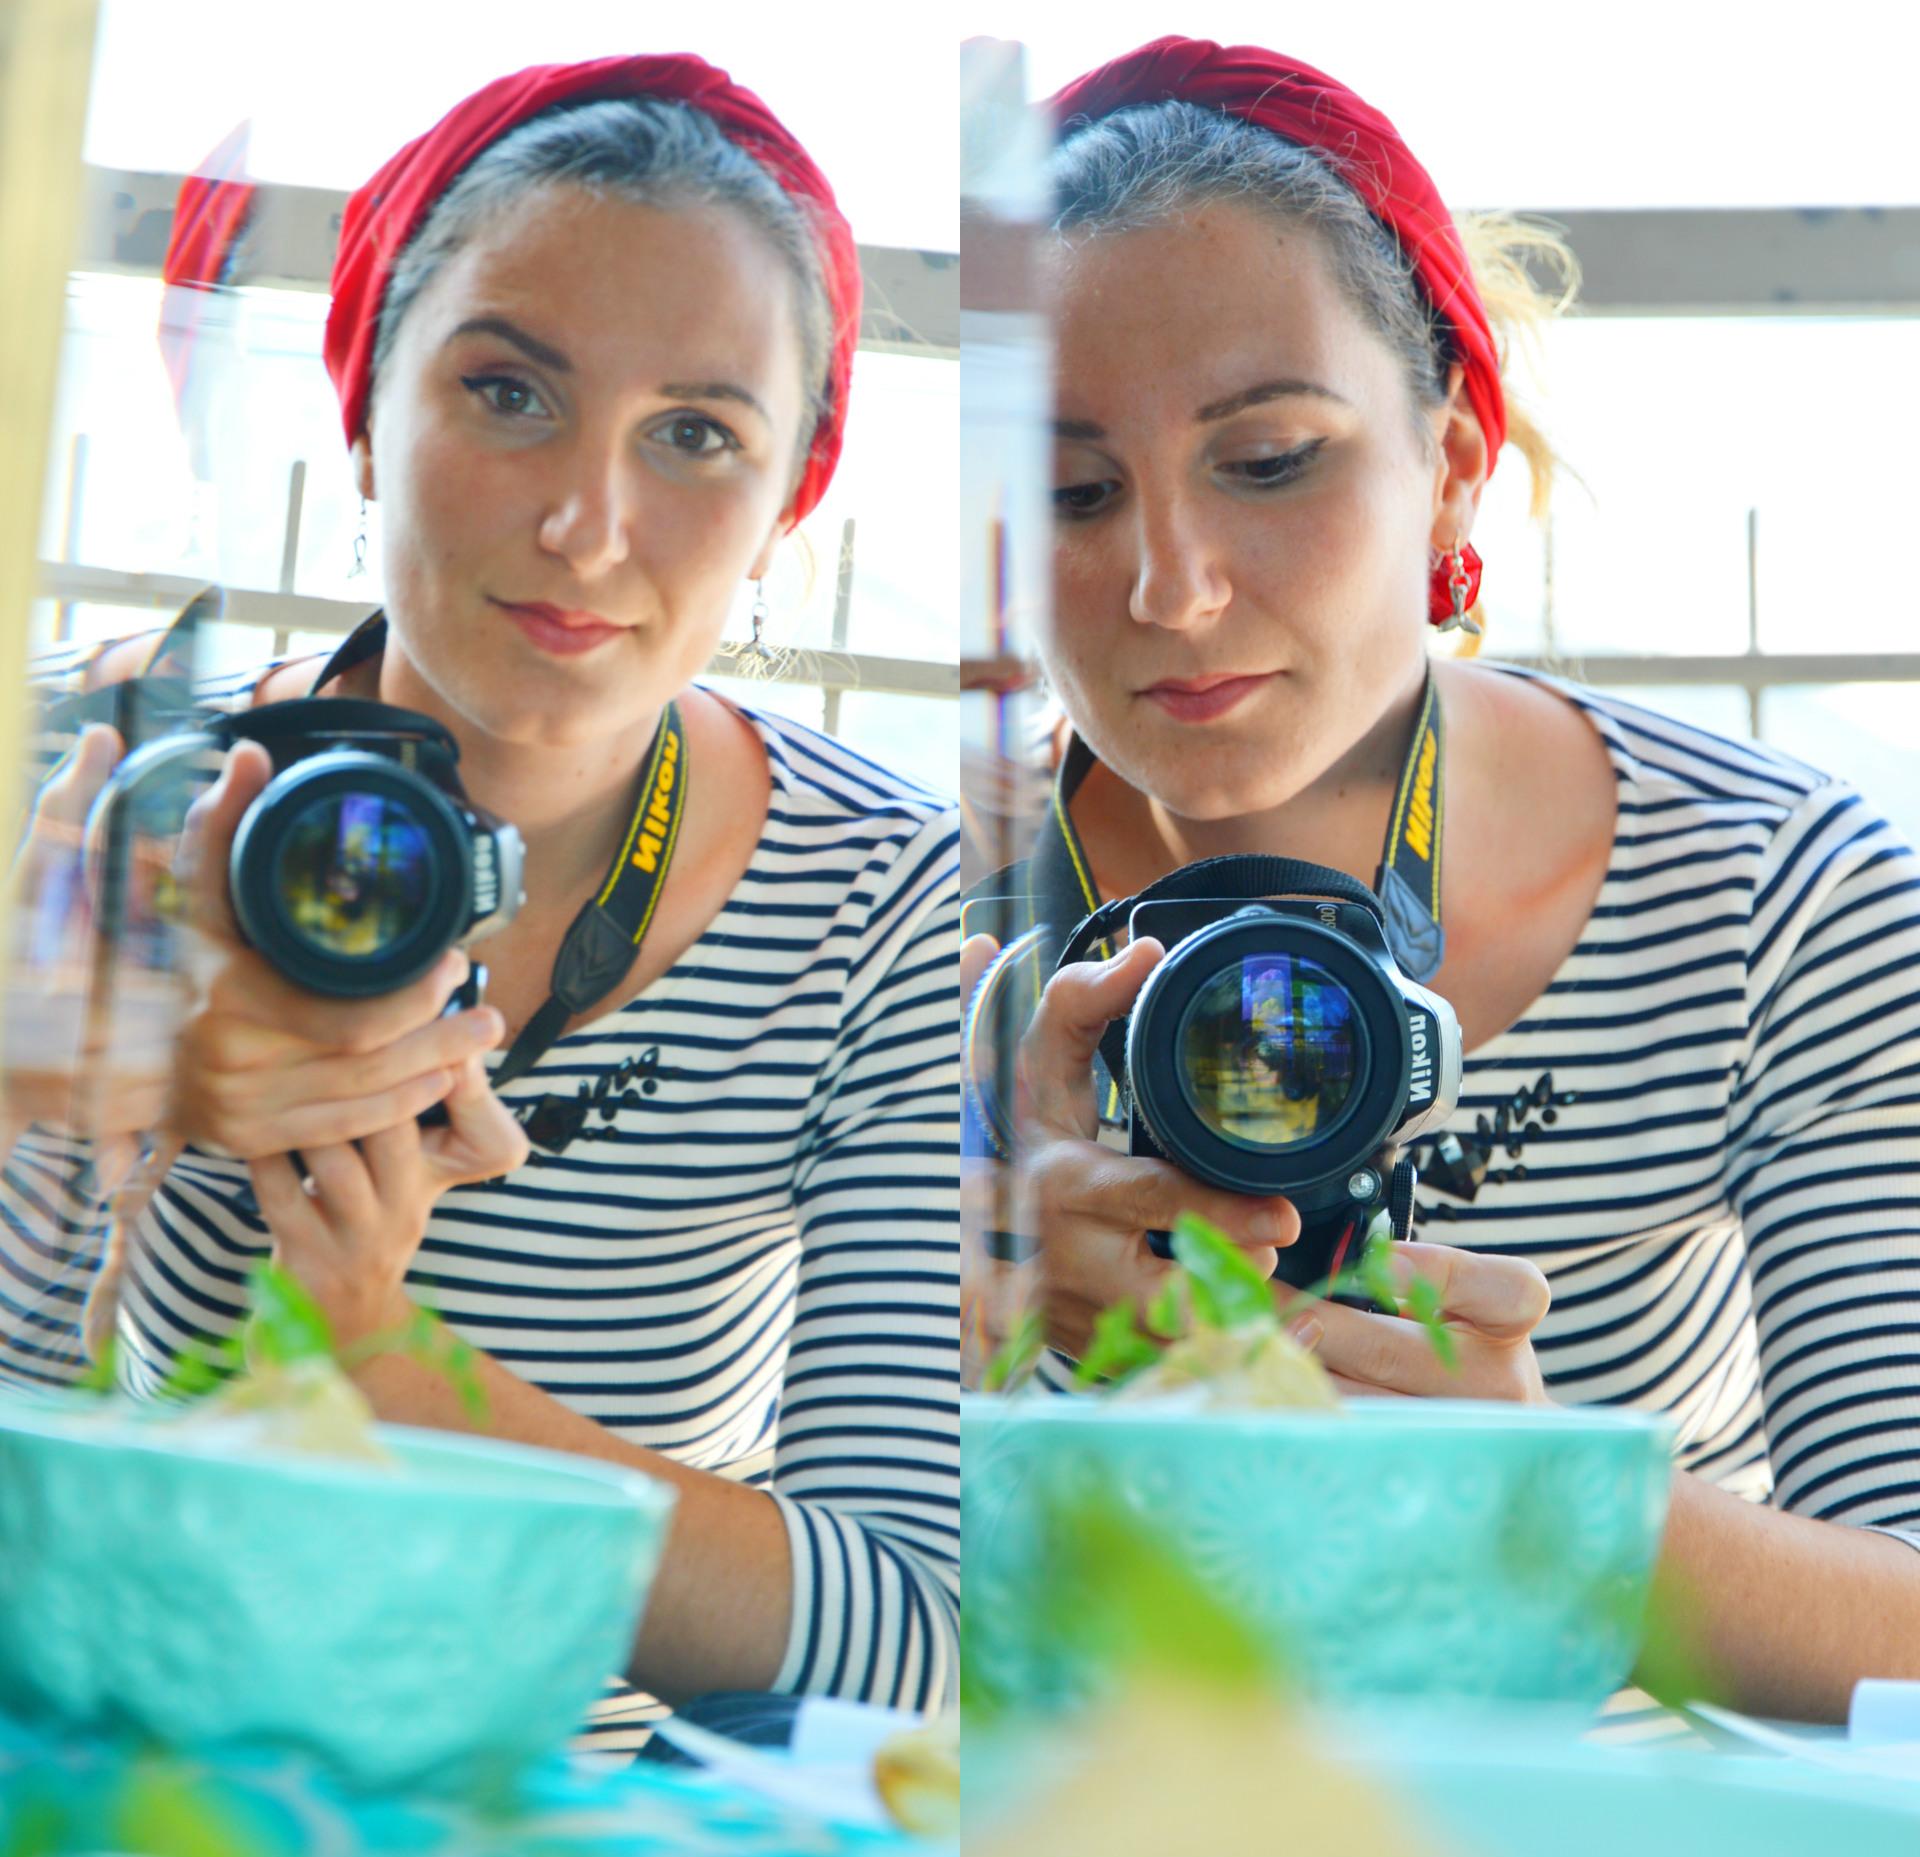 occhiovunque_valentina_scannapieco_foodblogger